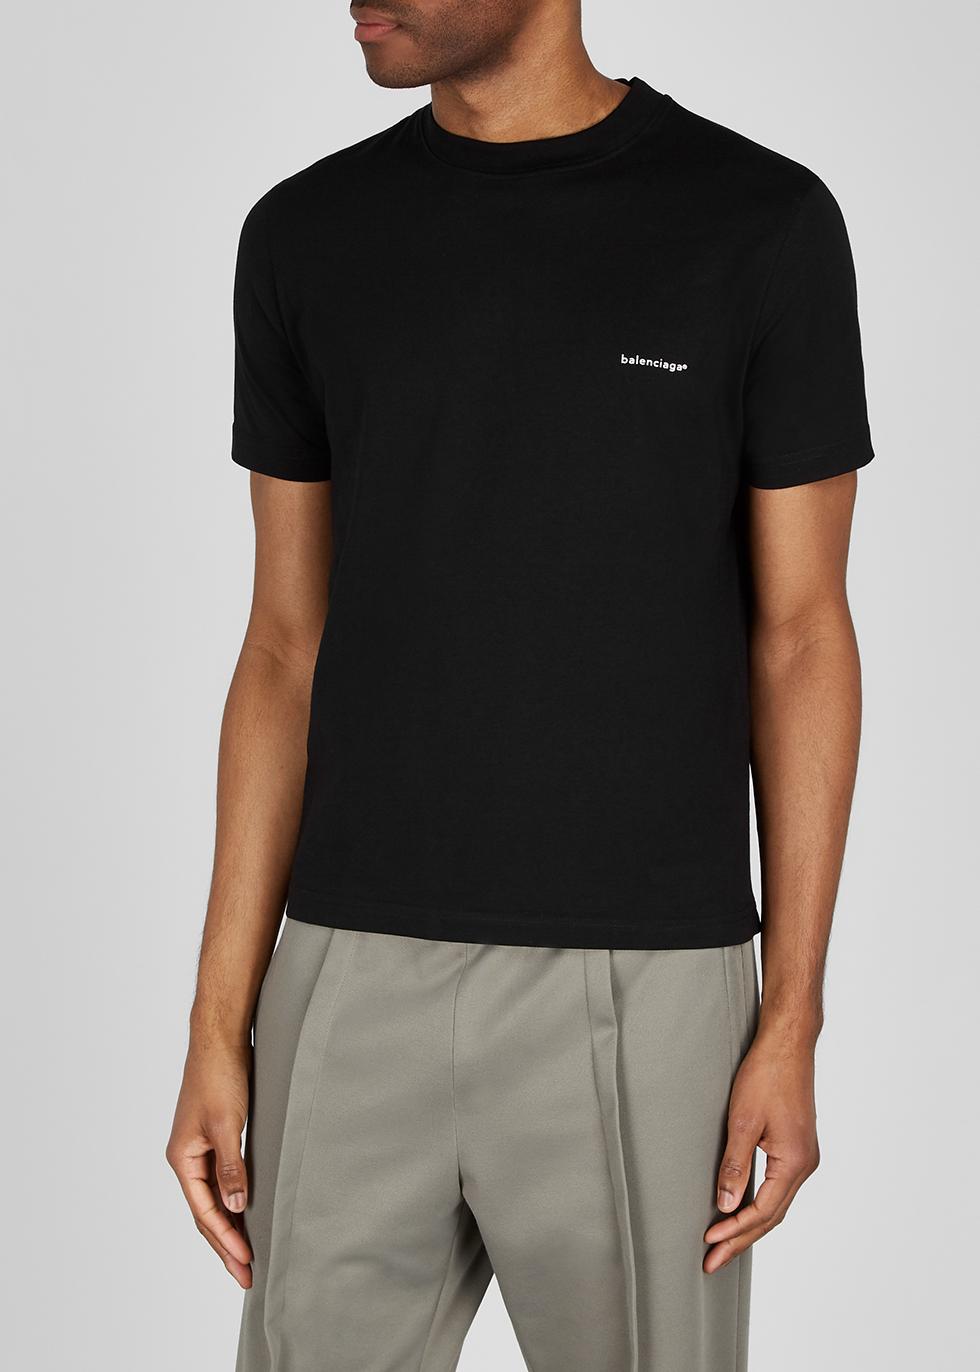 black cotton T-shirt - Harvey Nichols